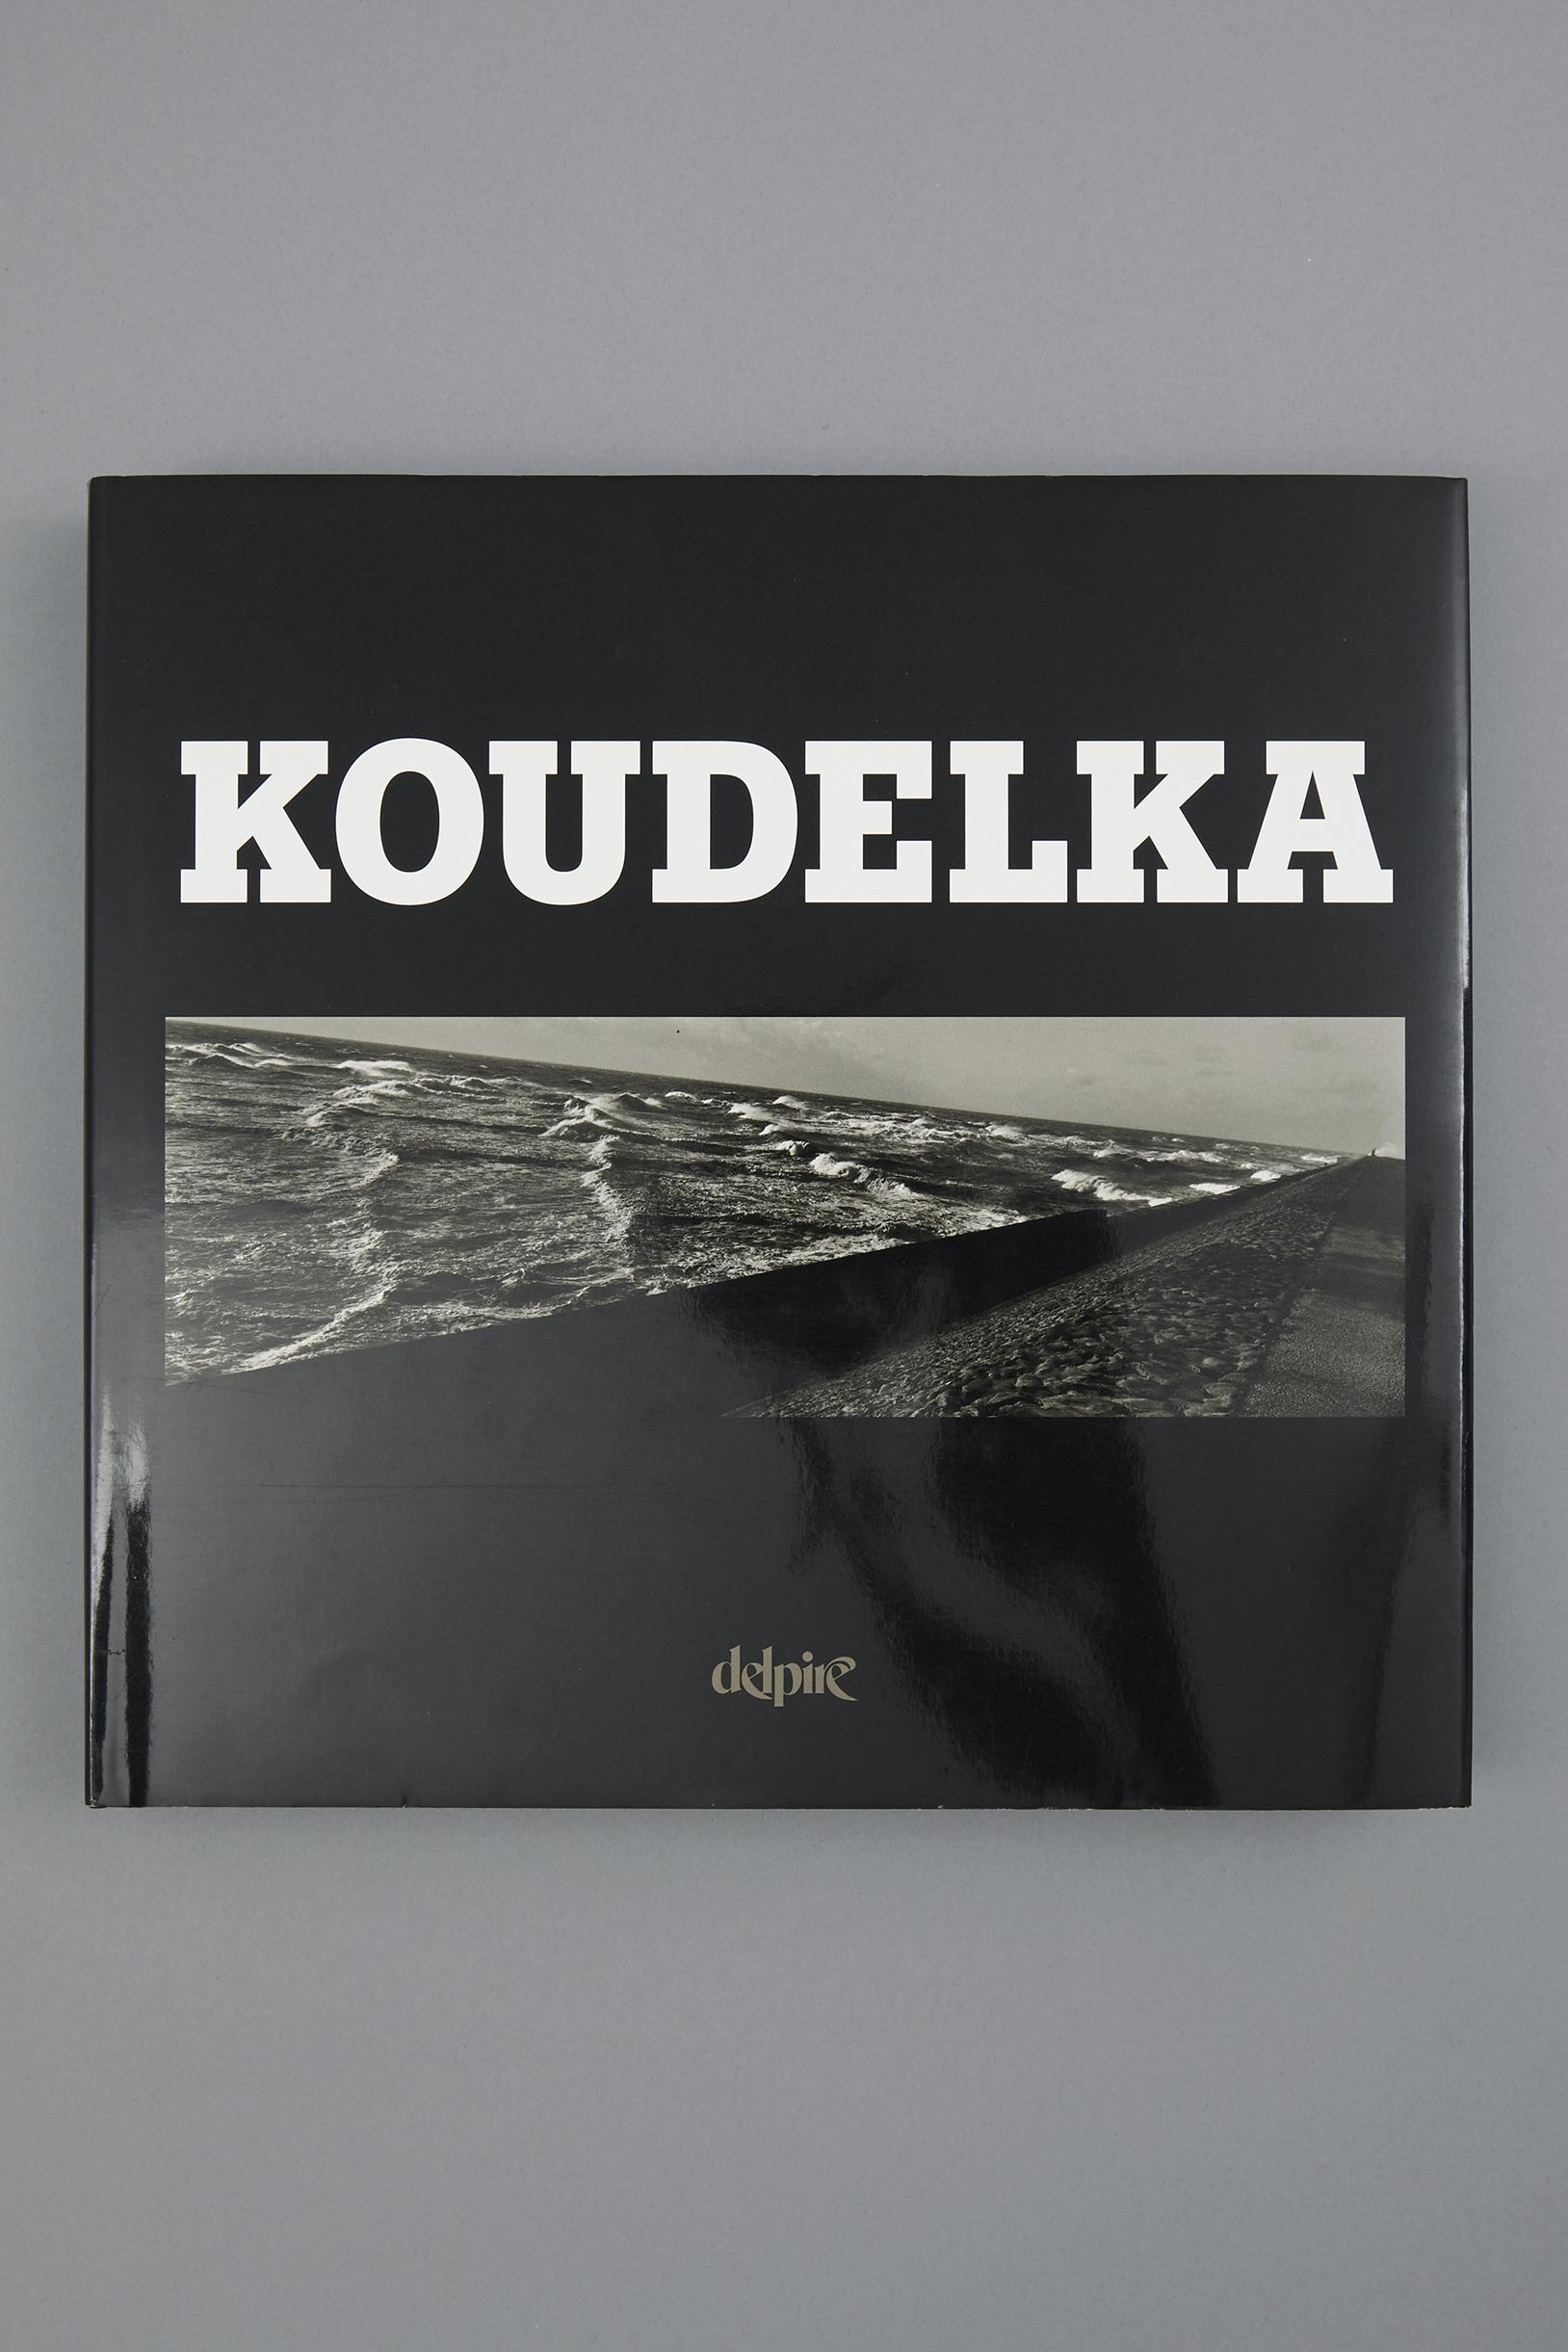 koudelka-delpire-maestro-couverture